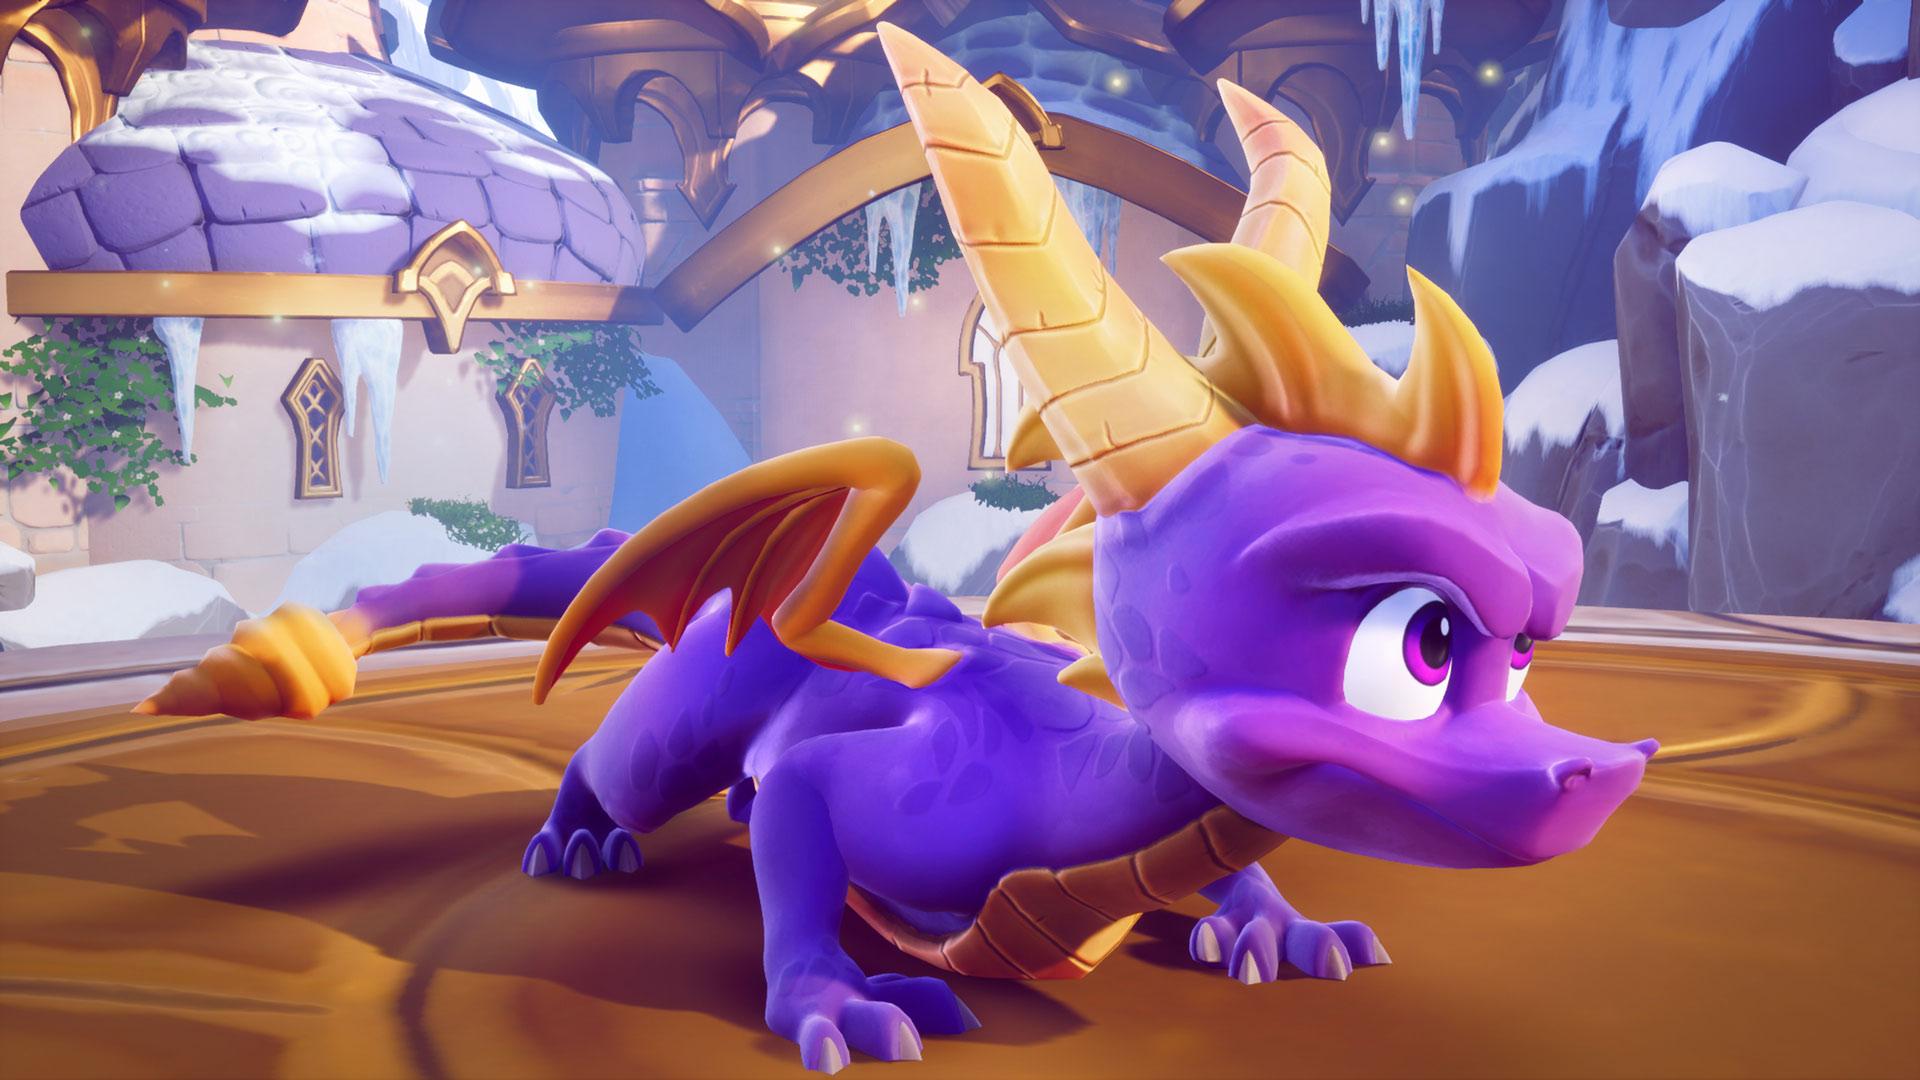 spyro the dragon pc game free download